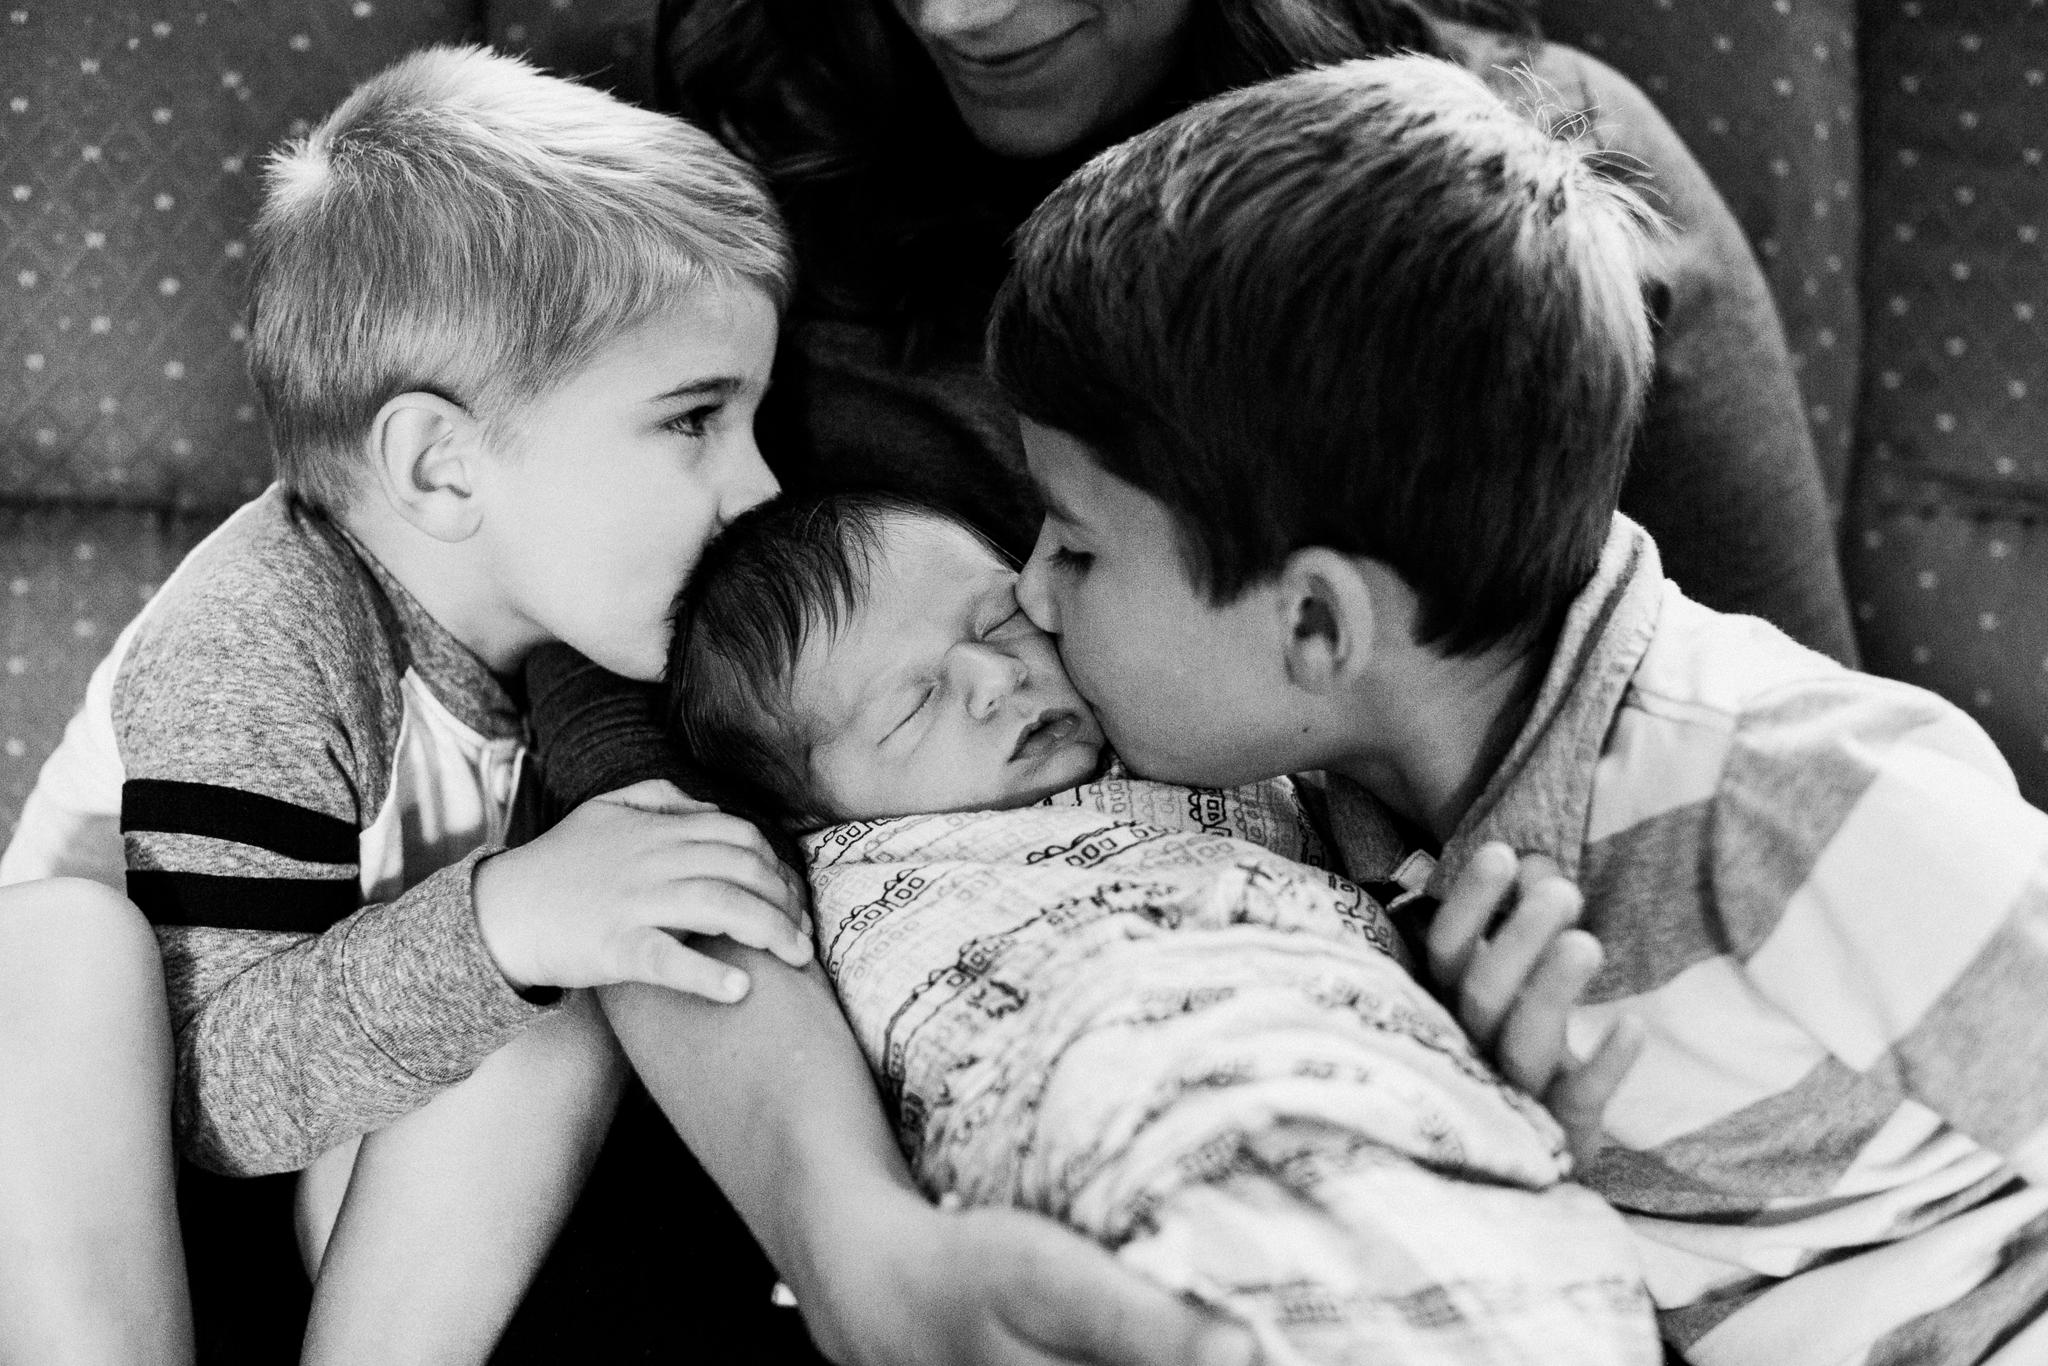 dekalb_il_lifestyle_newborn_photographer_palos_heights_il_0014.jpg